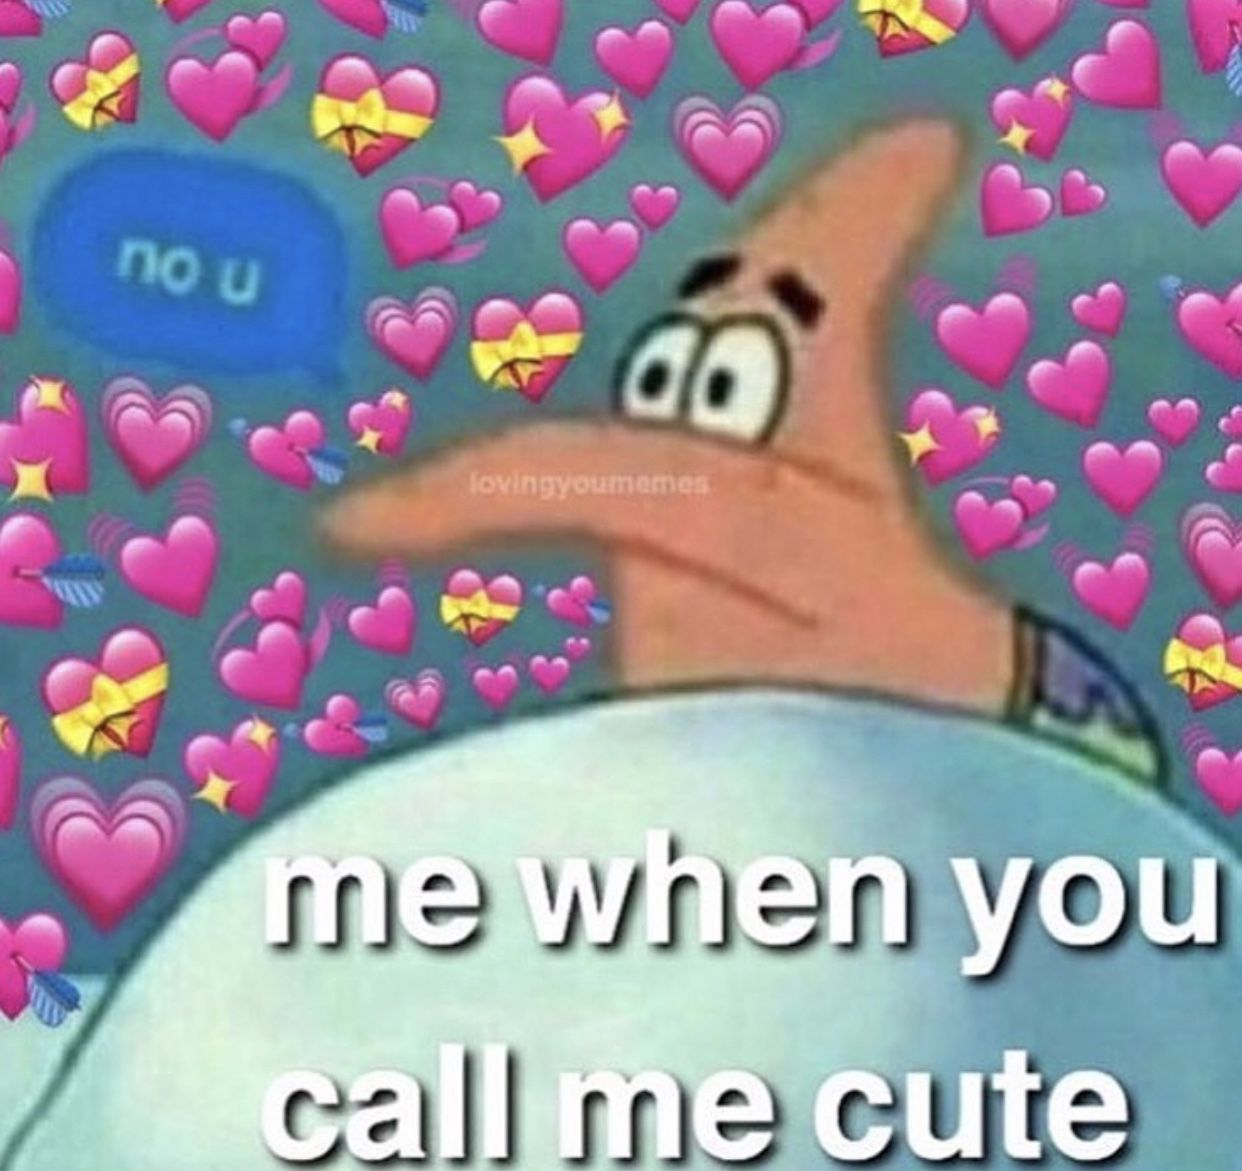 Pin By Tvgravell Vg On Cosas Que Me Pasan Cute Love Memes Cute Memes Love You Meme